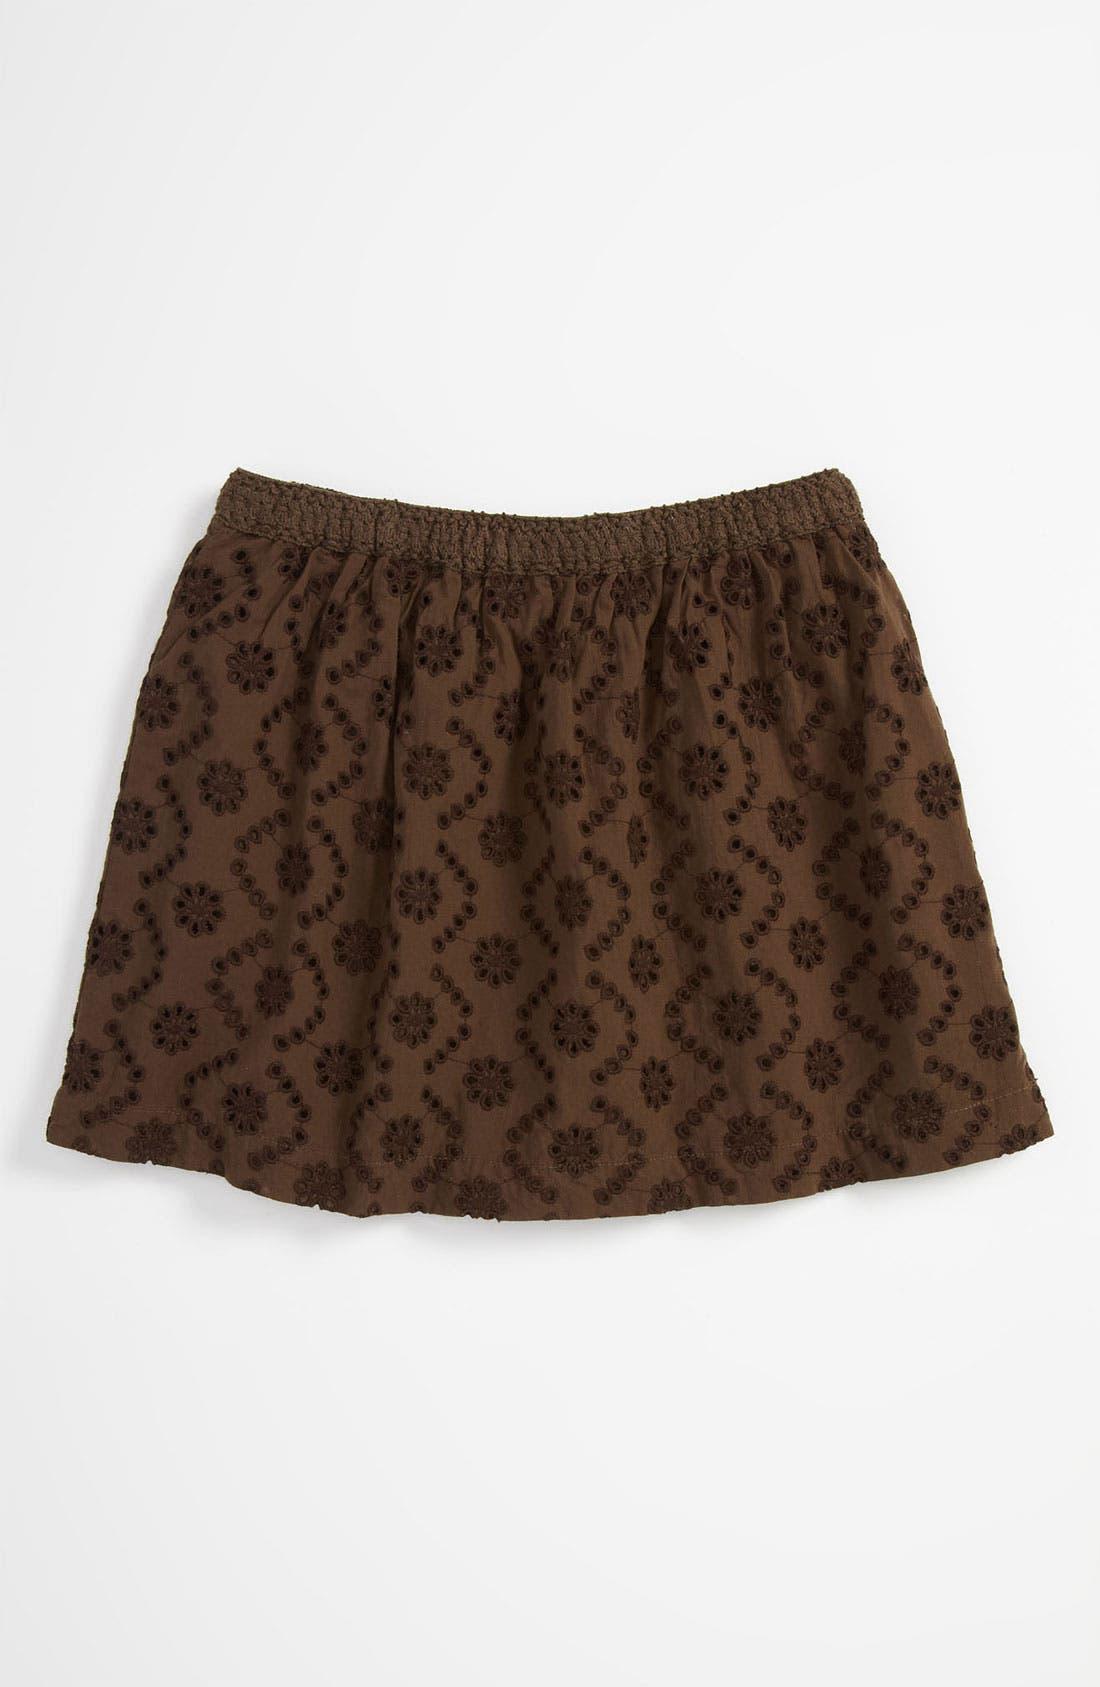 Main Image - Peek 'Inez' Skirt (Toddler, Little Girls & Big Girls)